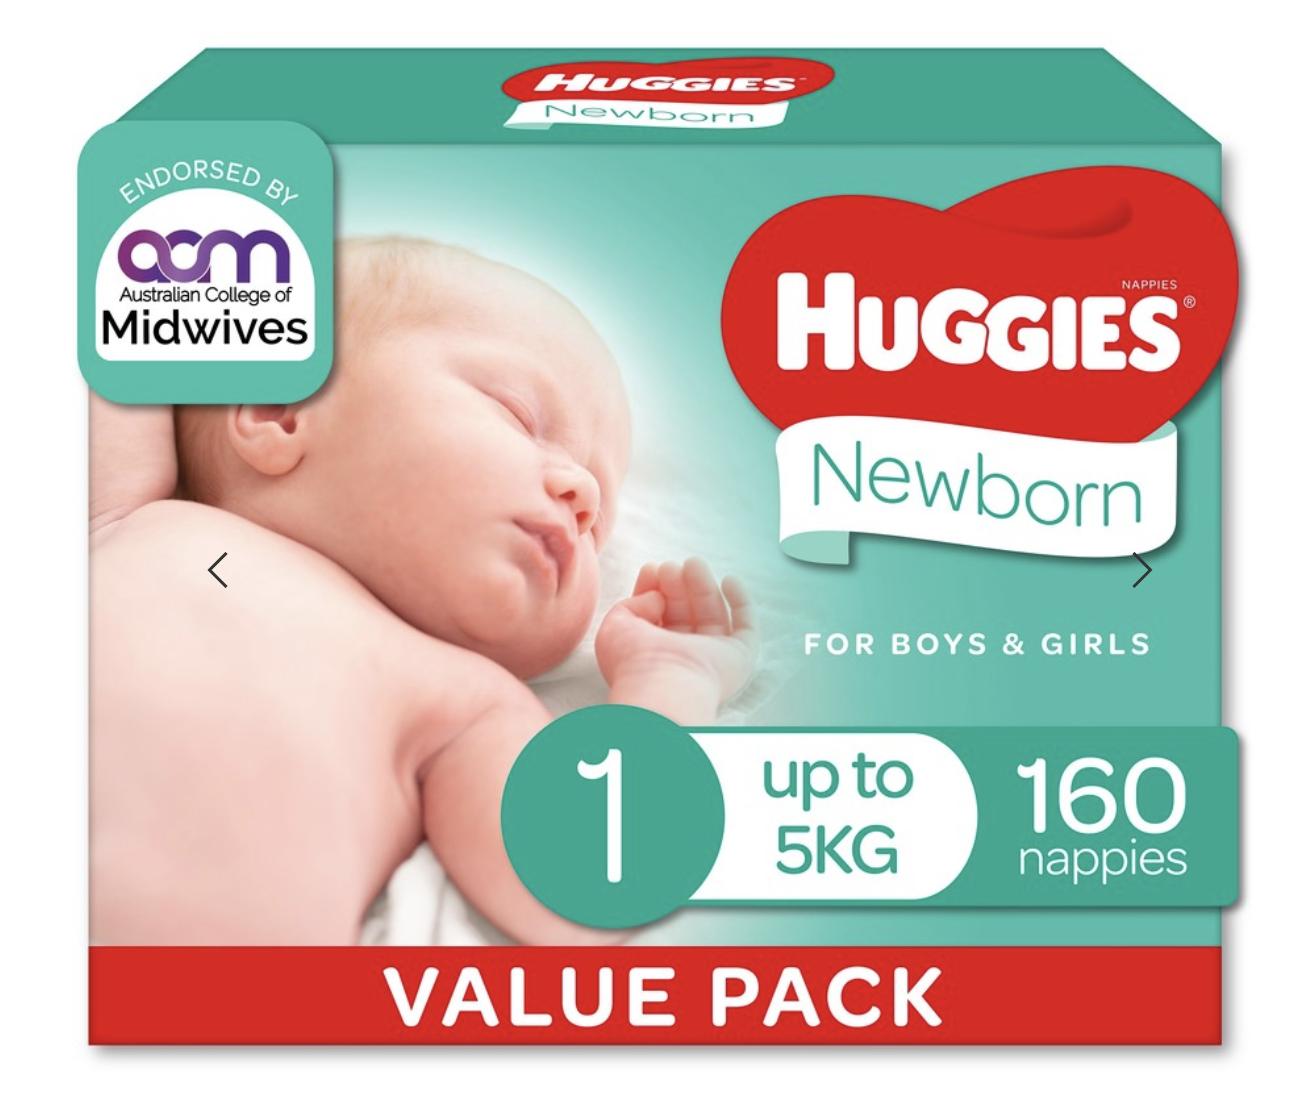 Baby wipes & nappies (Huggies)